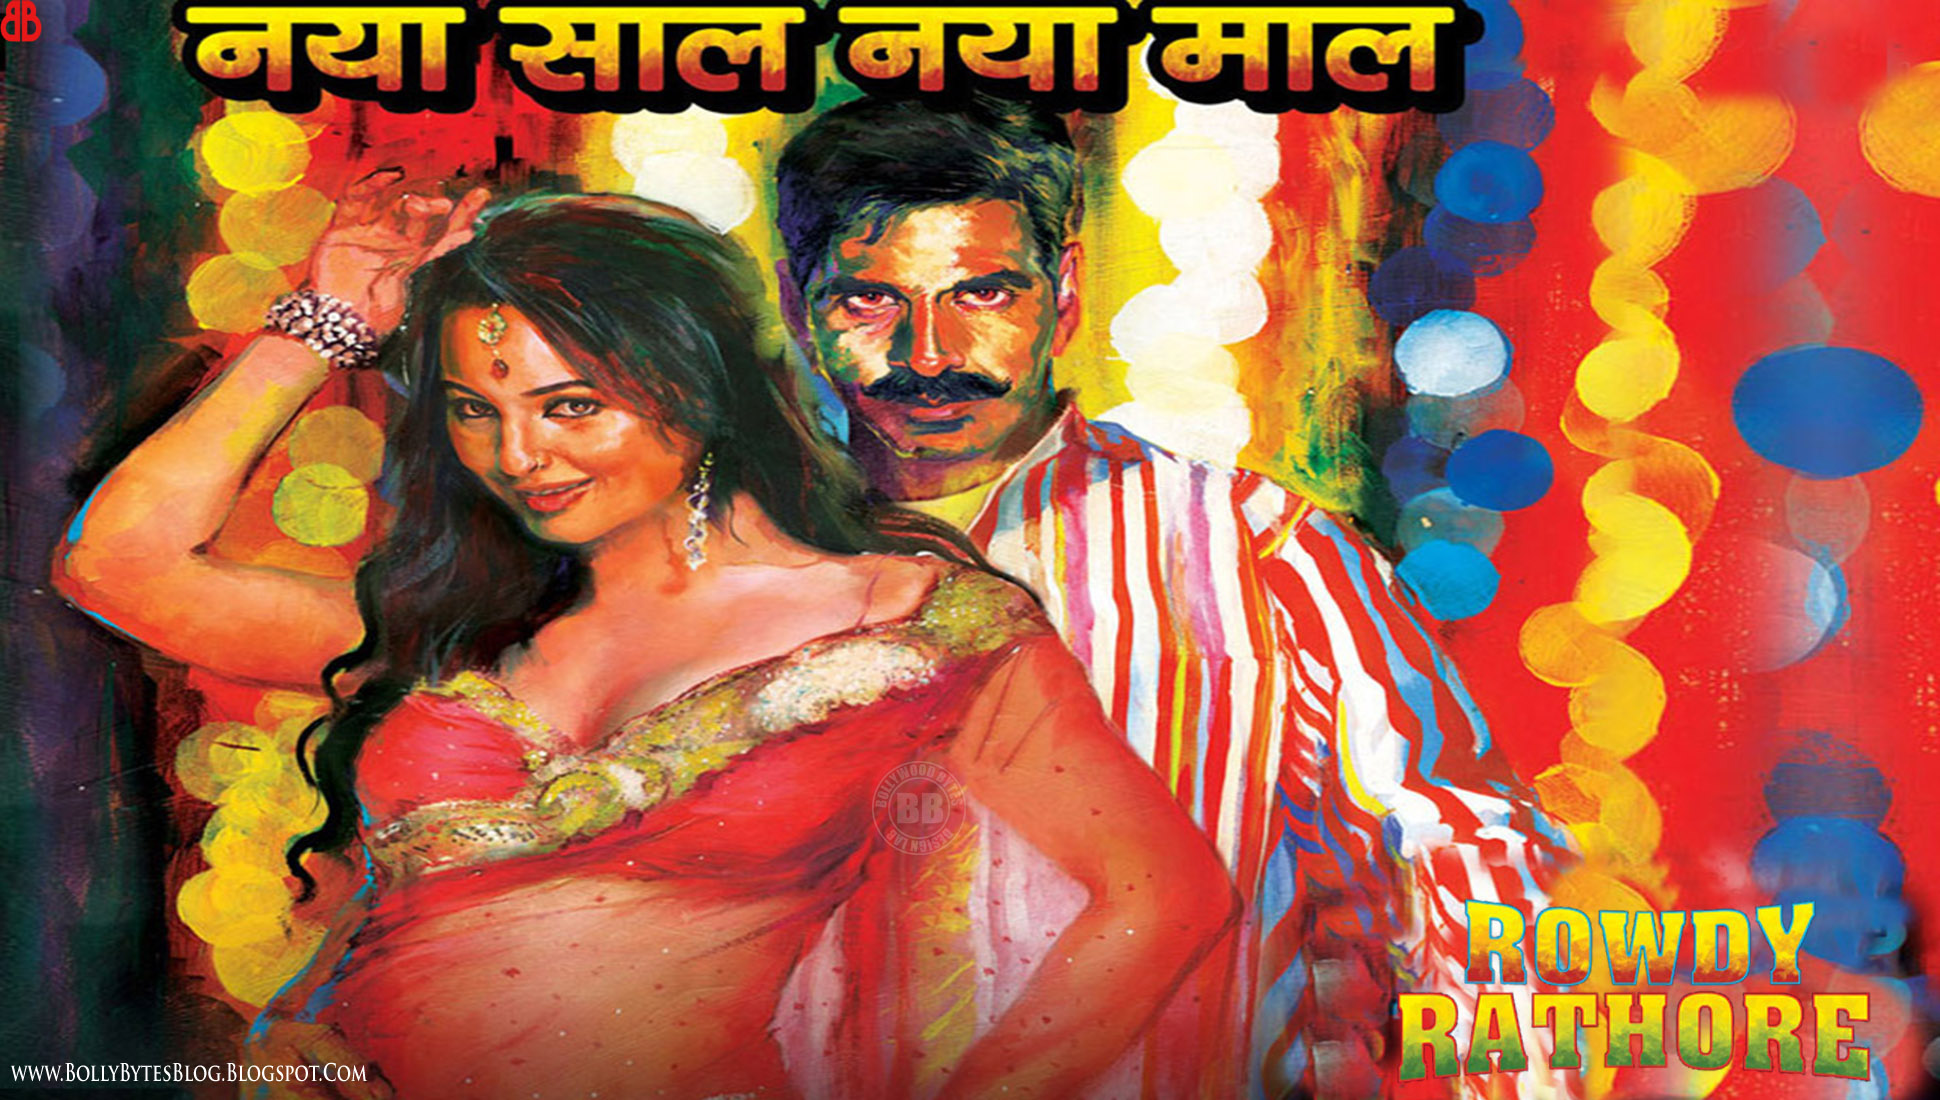 http://2.bp.blogspot.com/-Dwa9EXROG9E/T5iaJ5im1hI/AAAAAAAAG-8/091nUT2LMrE/s1940/Rowdy-Rathore-Akshay-Kumar-Hot-Sonakshi-Sinha-HQ-Wallpapers-03.jpg